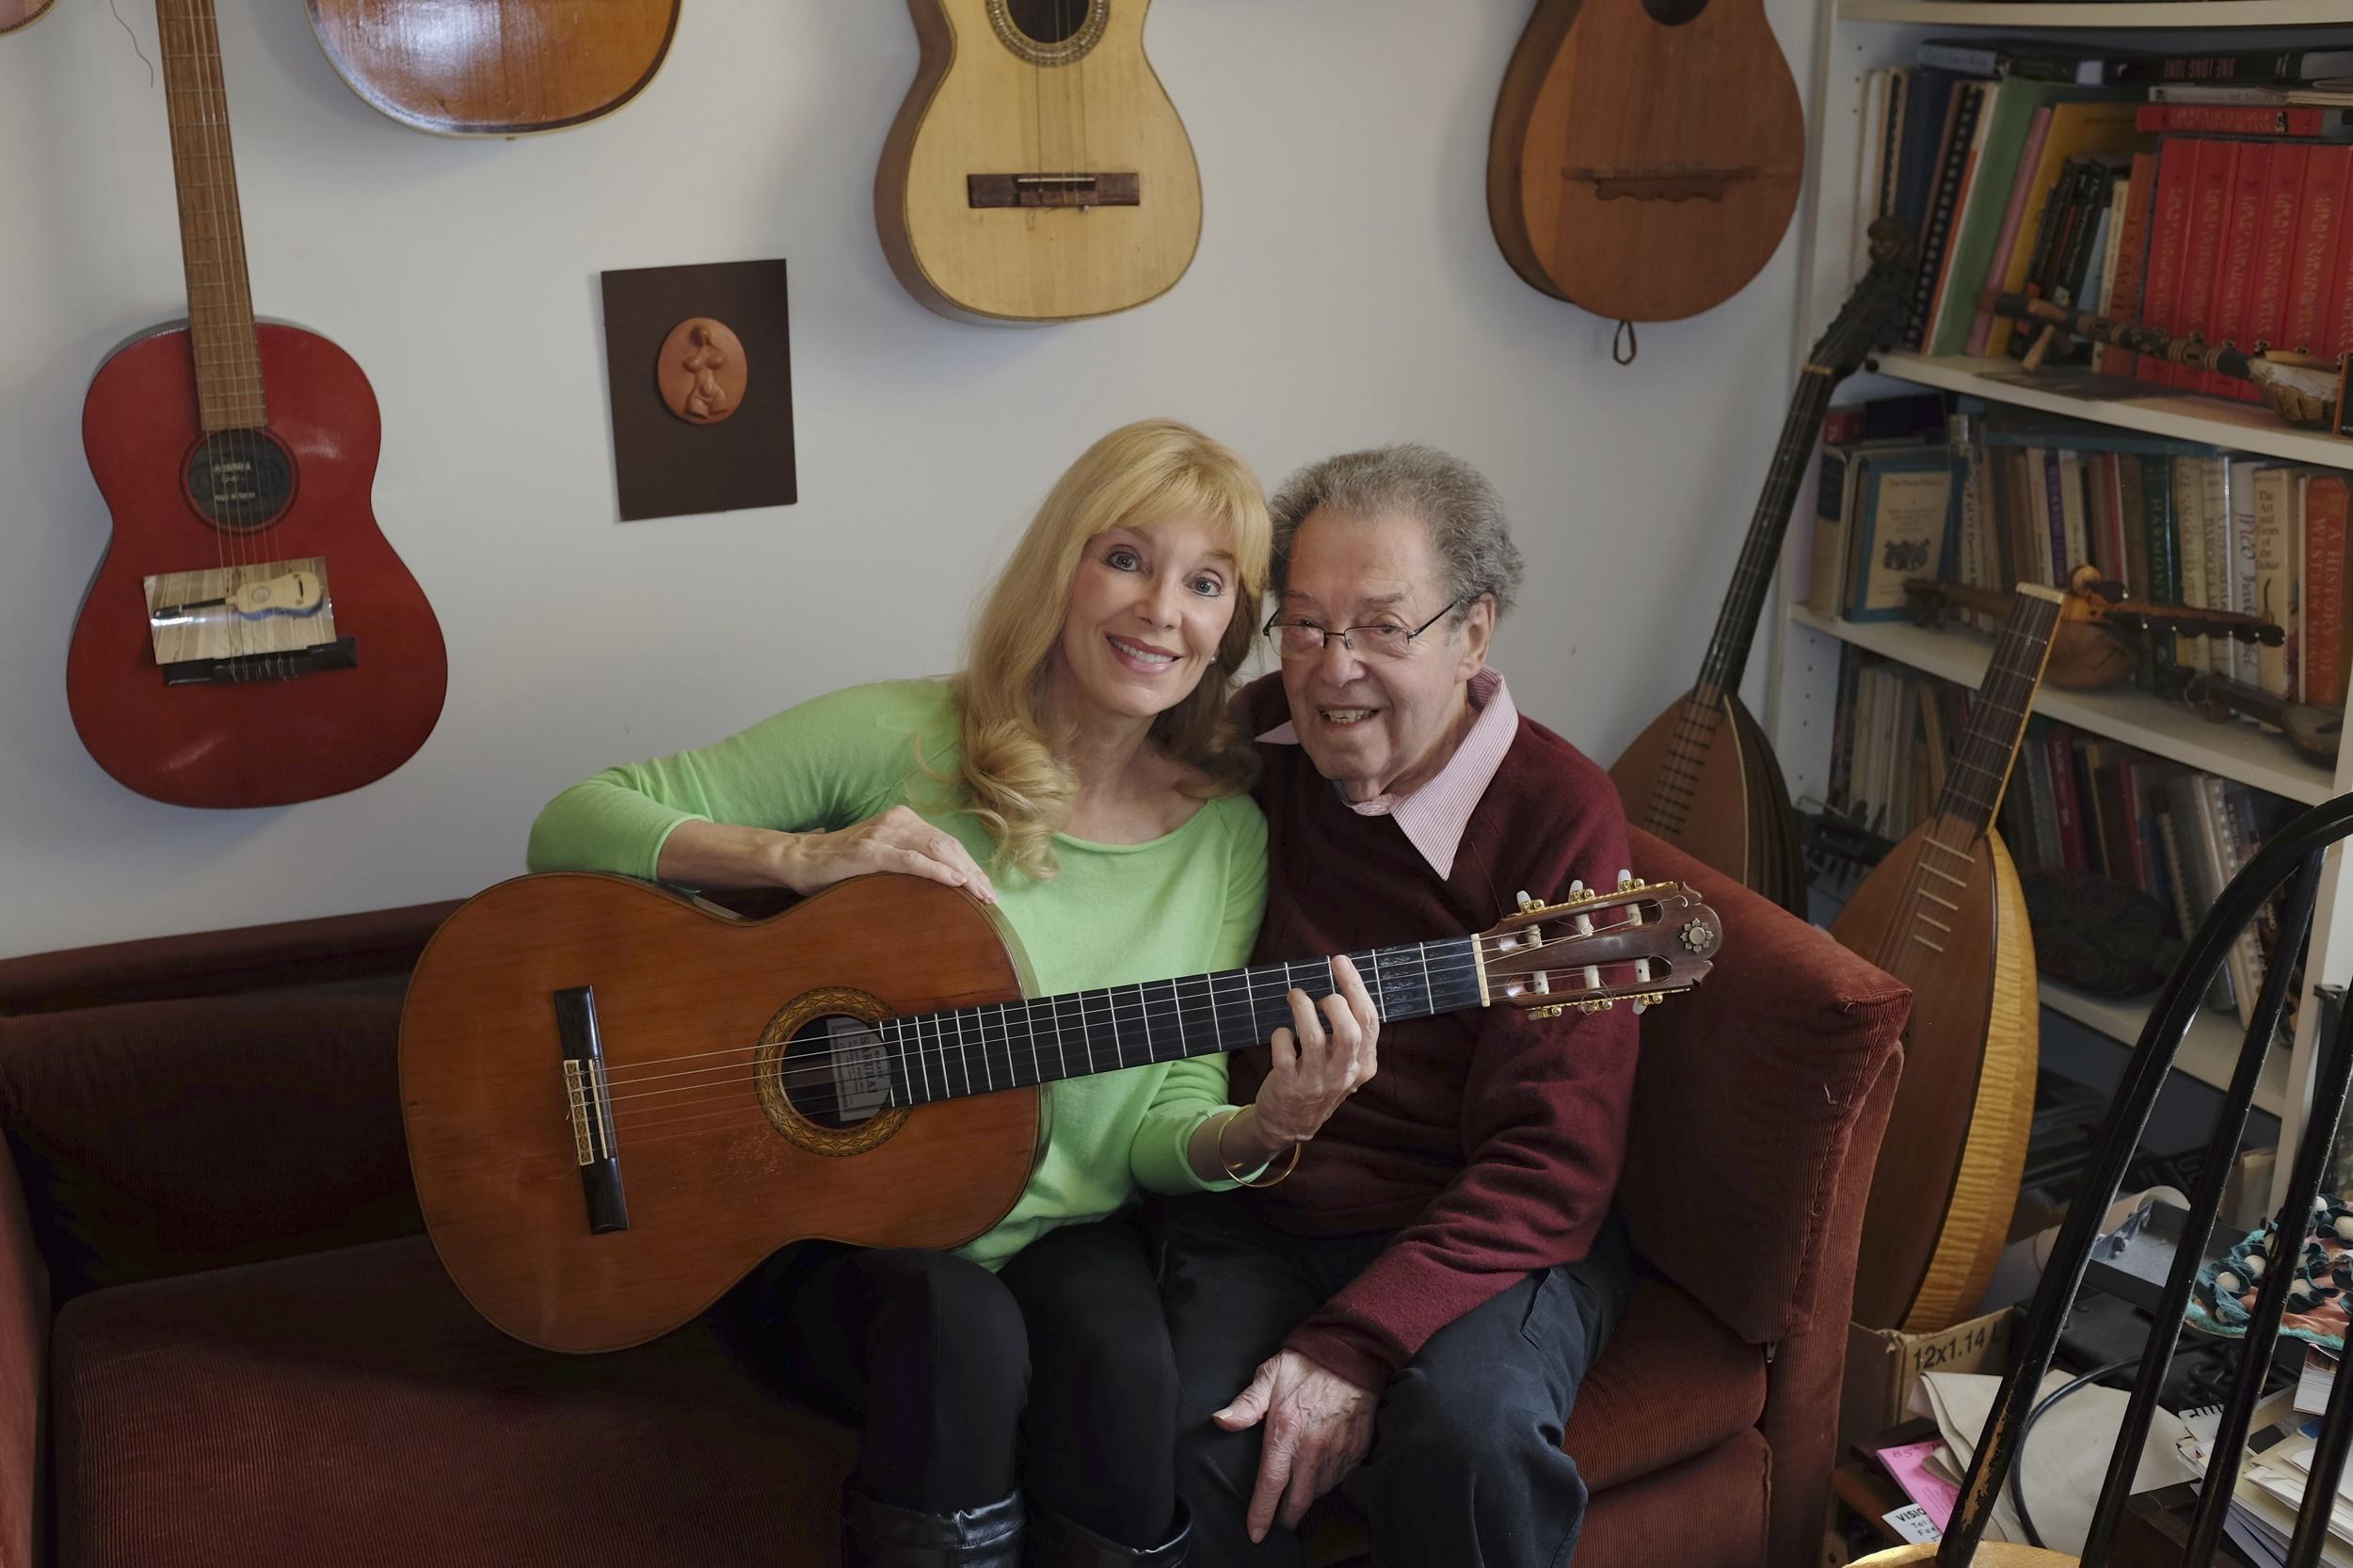 2014 with Eli Kassner, Liona's original guitar teacher